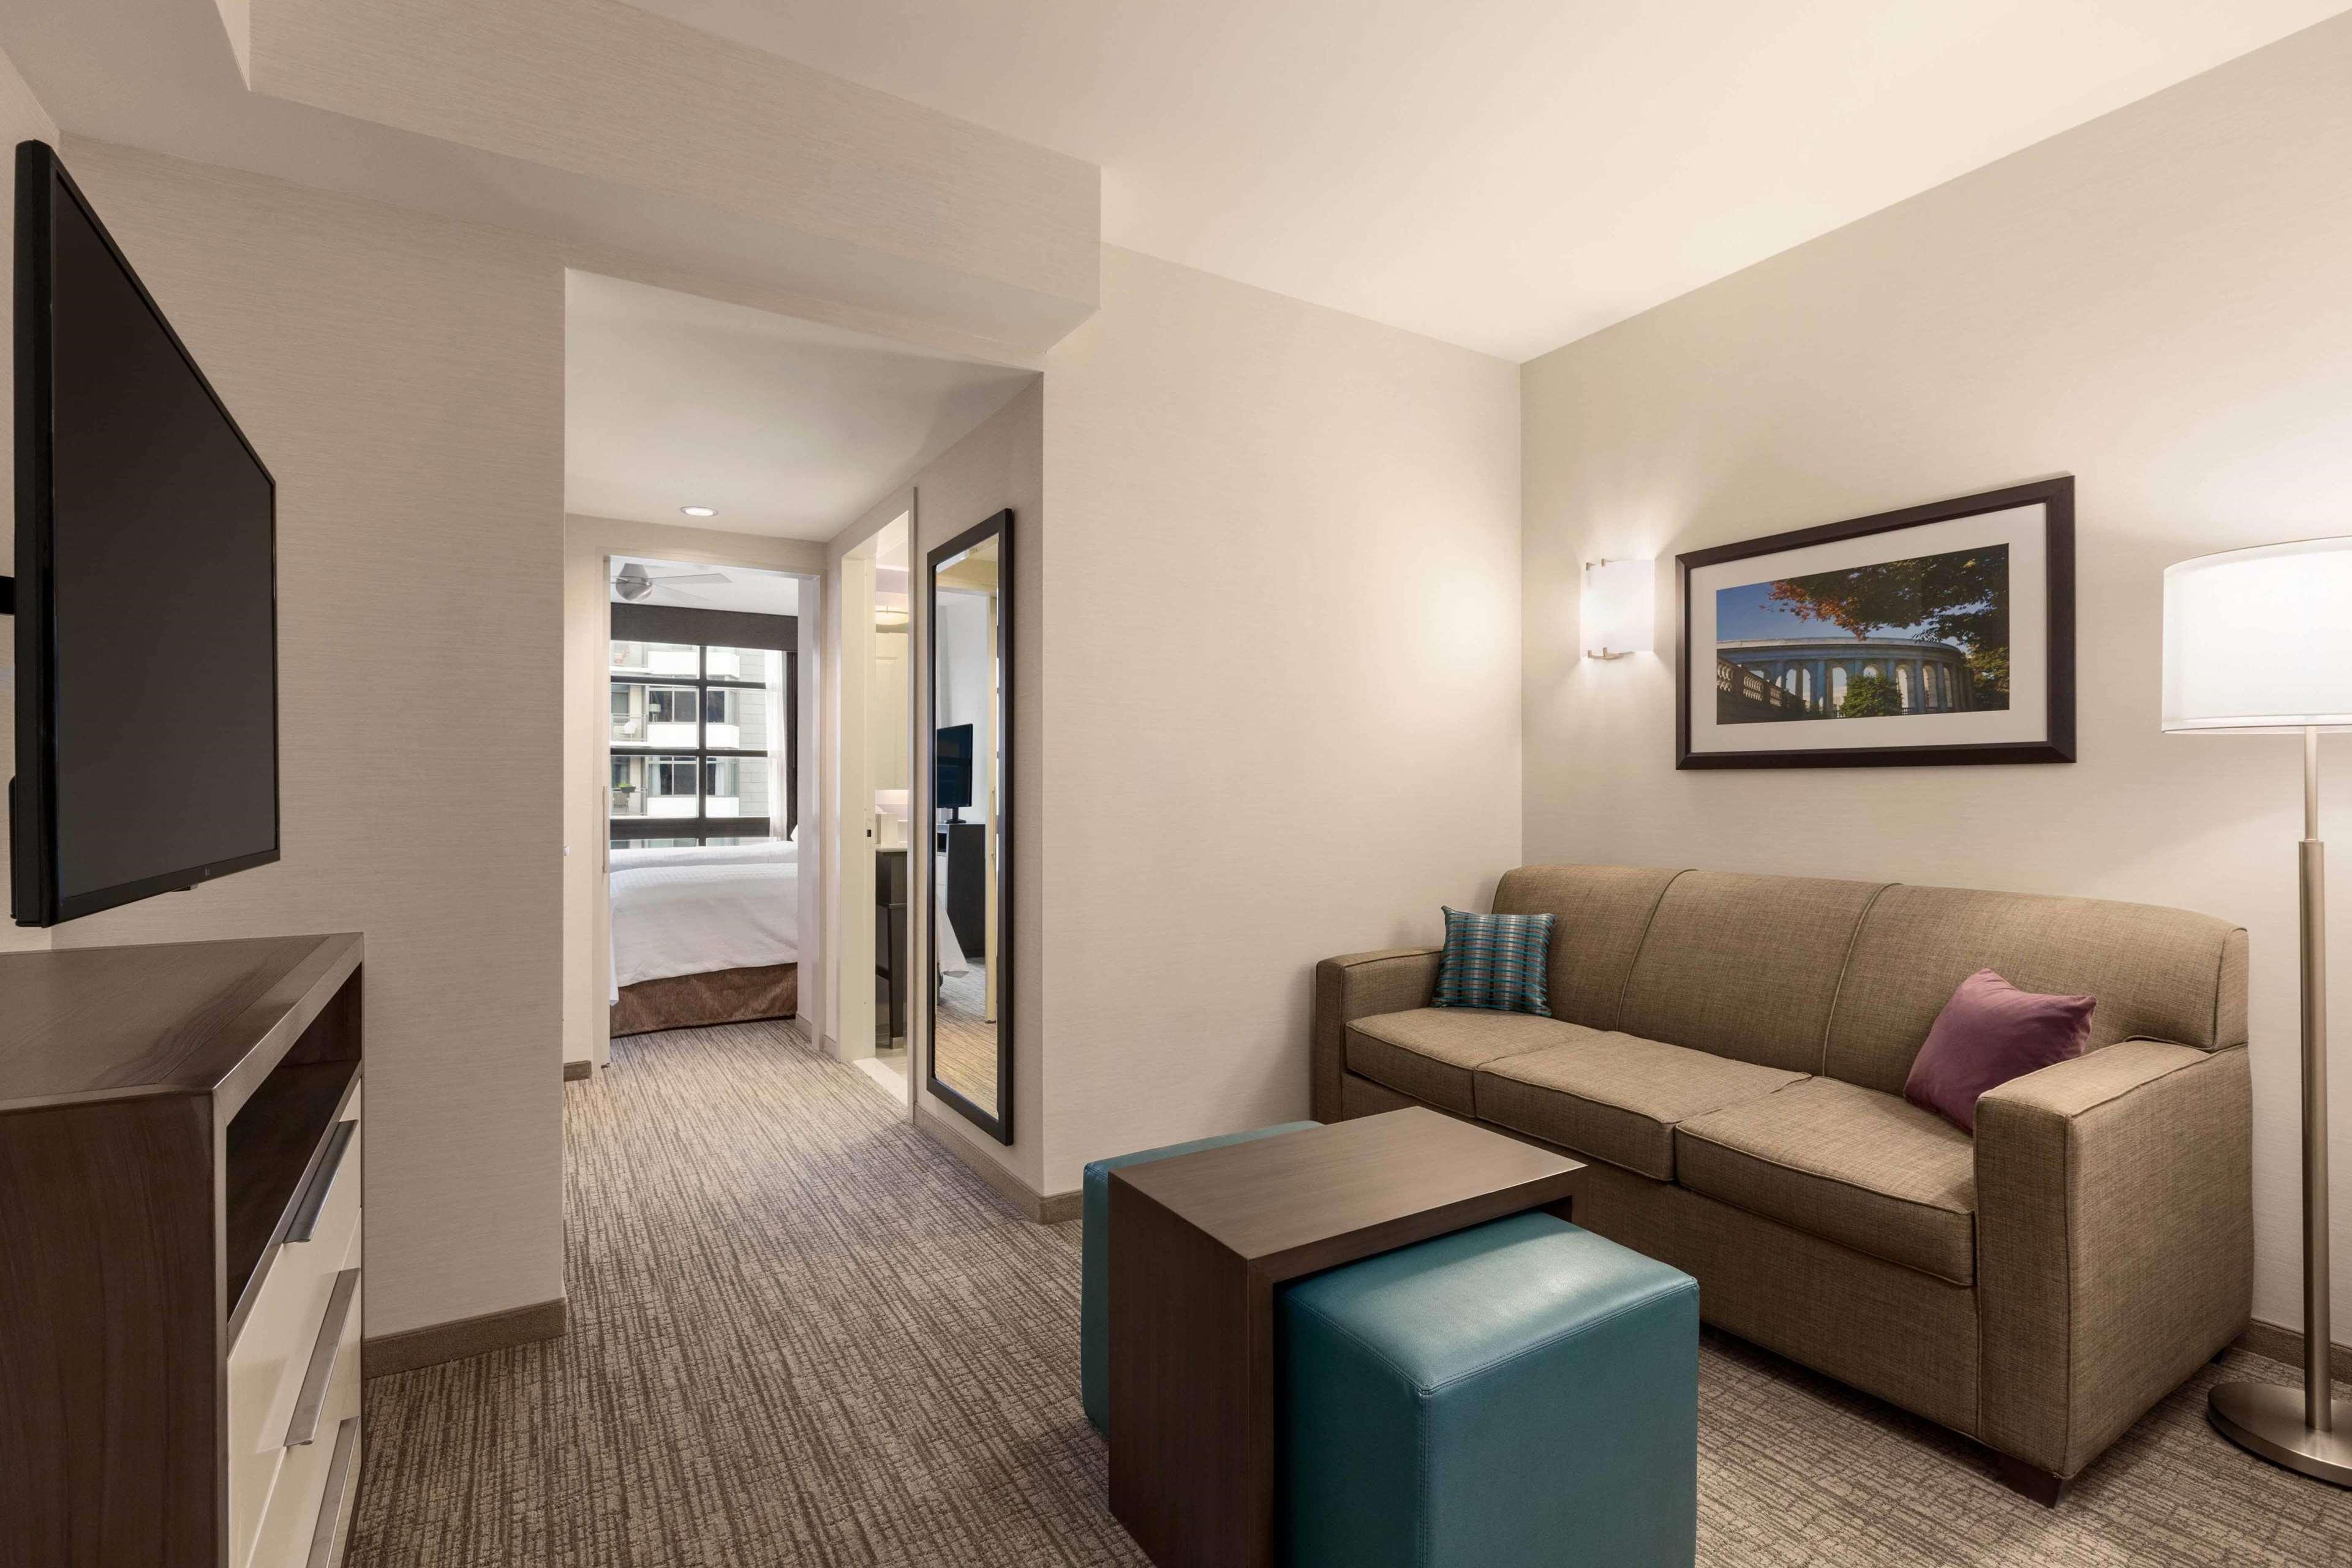 Homewood Suites by Hilton Washington DC Convention Center image 22